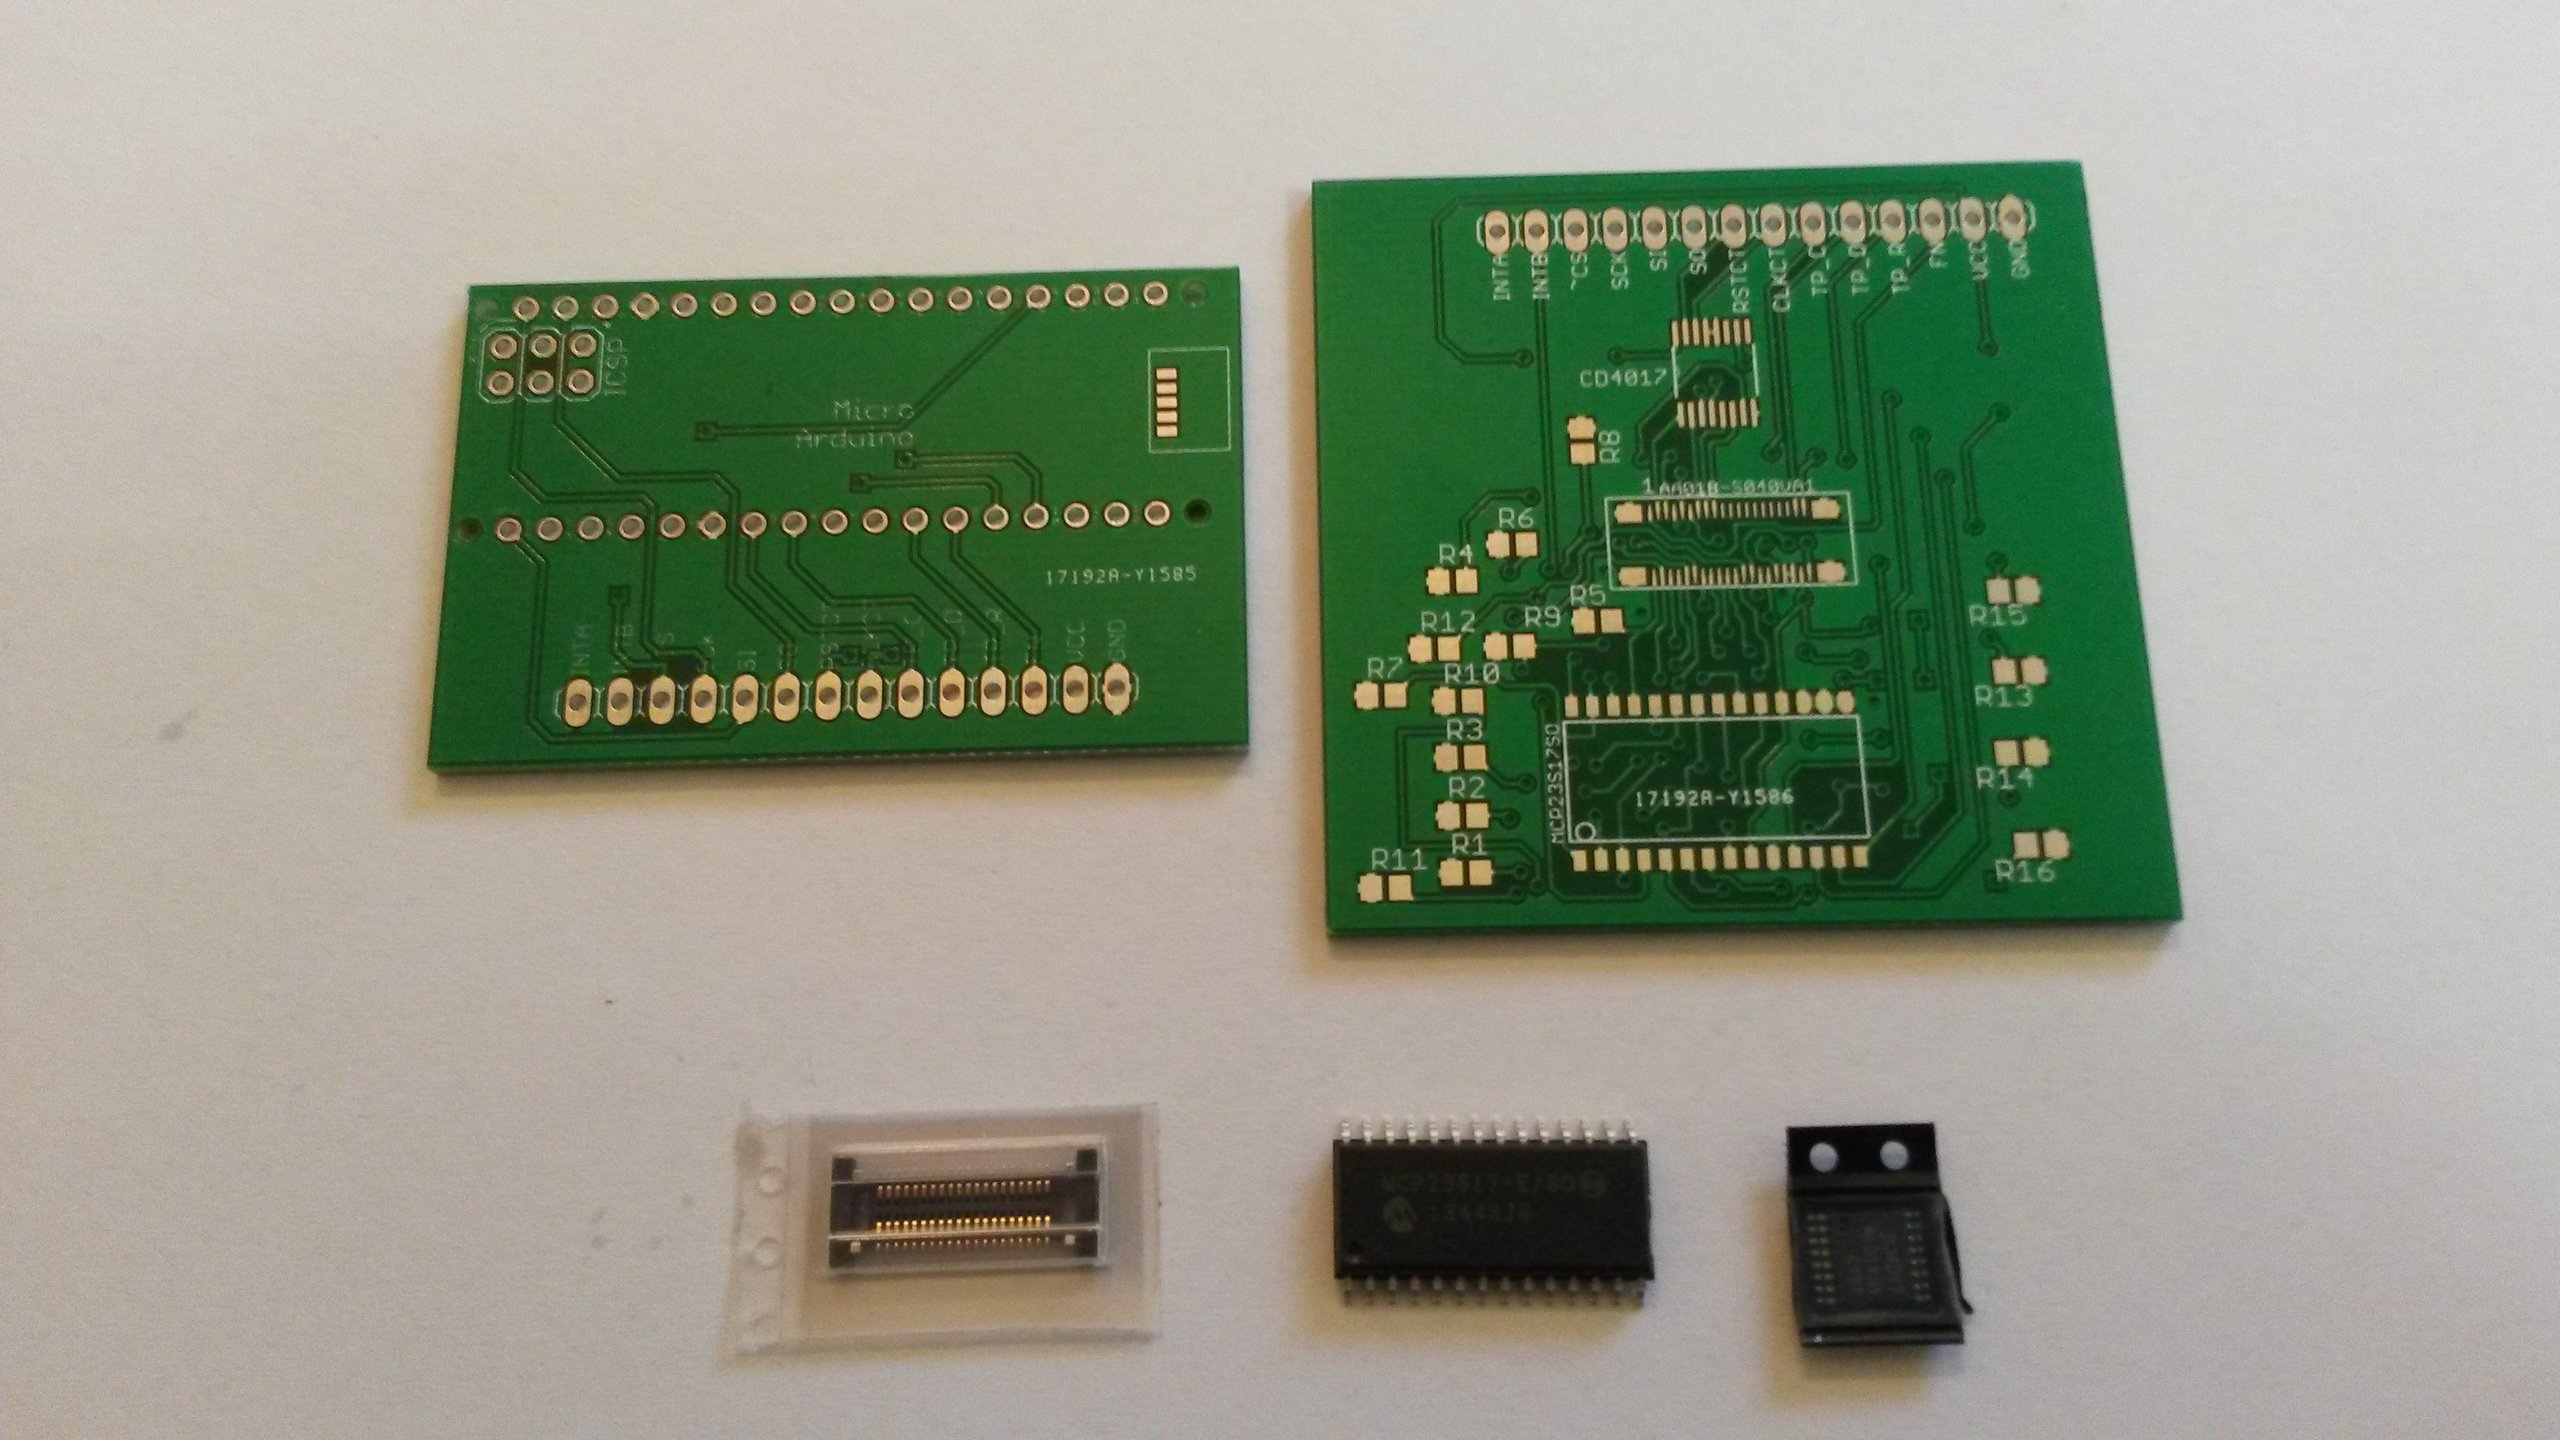 Arduino thinkpad usb keyboard adapter kit from rampadc on